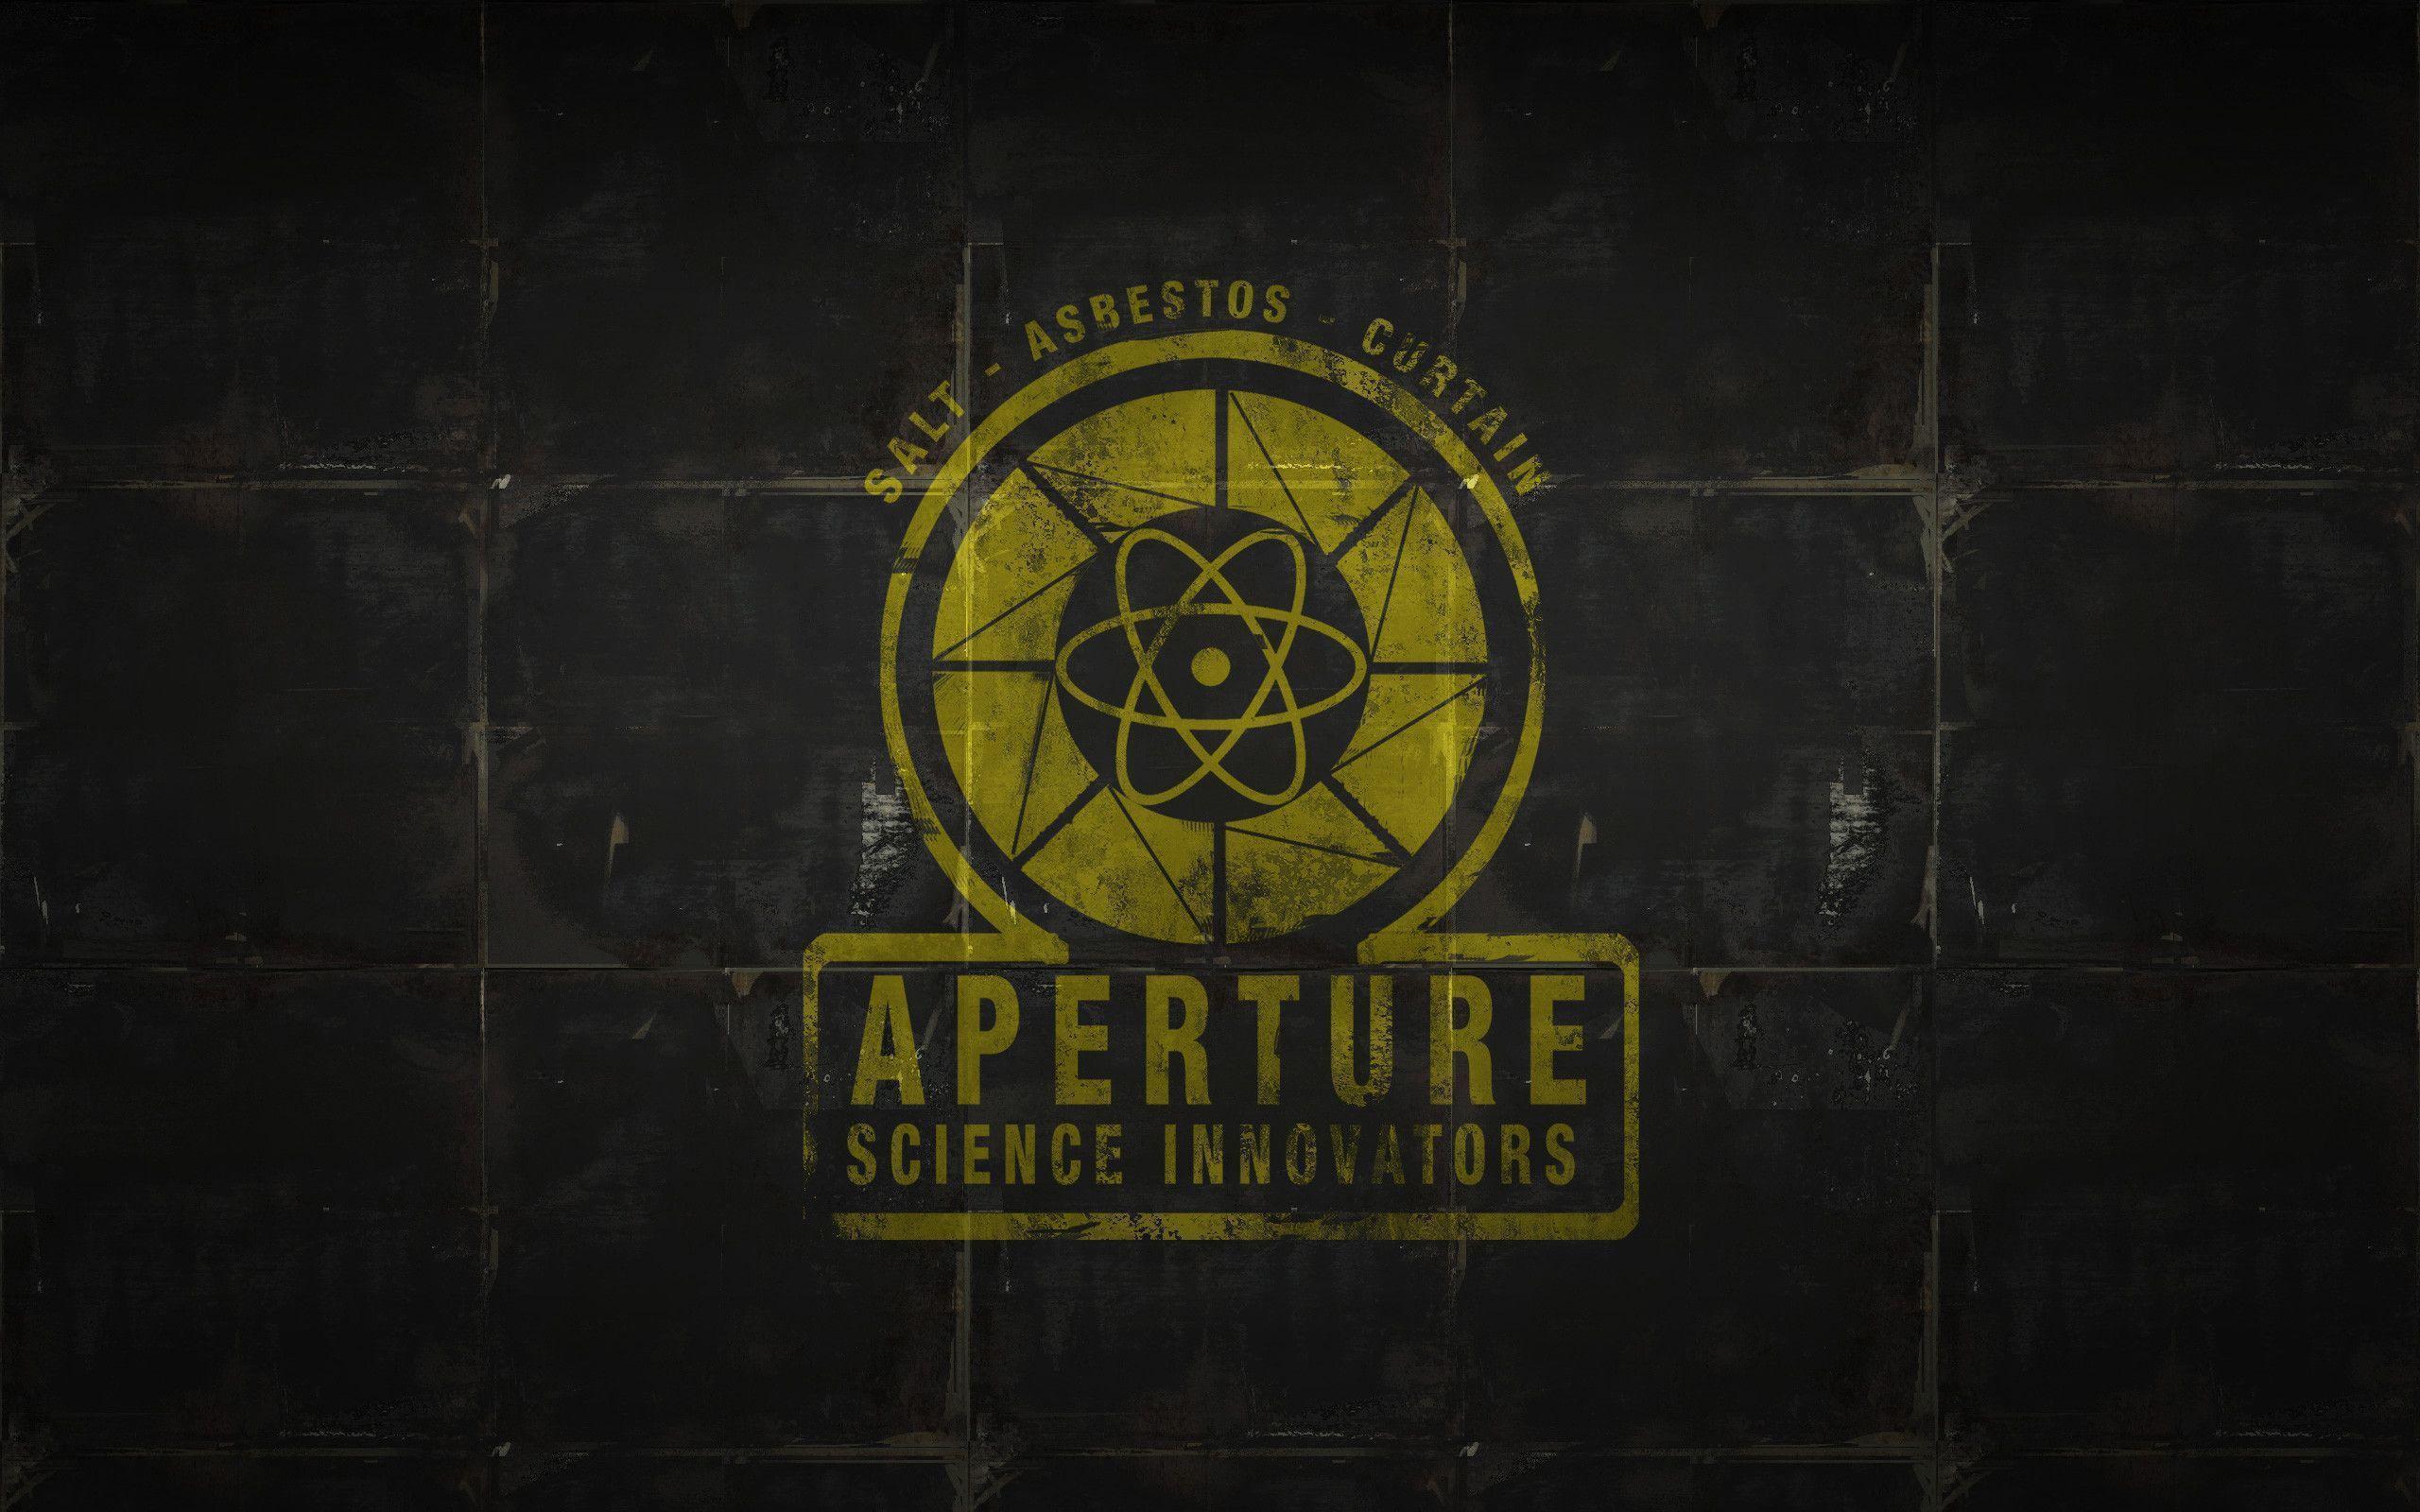 Aperture Science Wallpapers Wallpaper CaveAperture Science Innovators